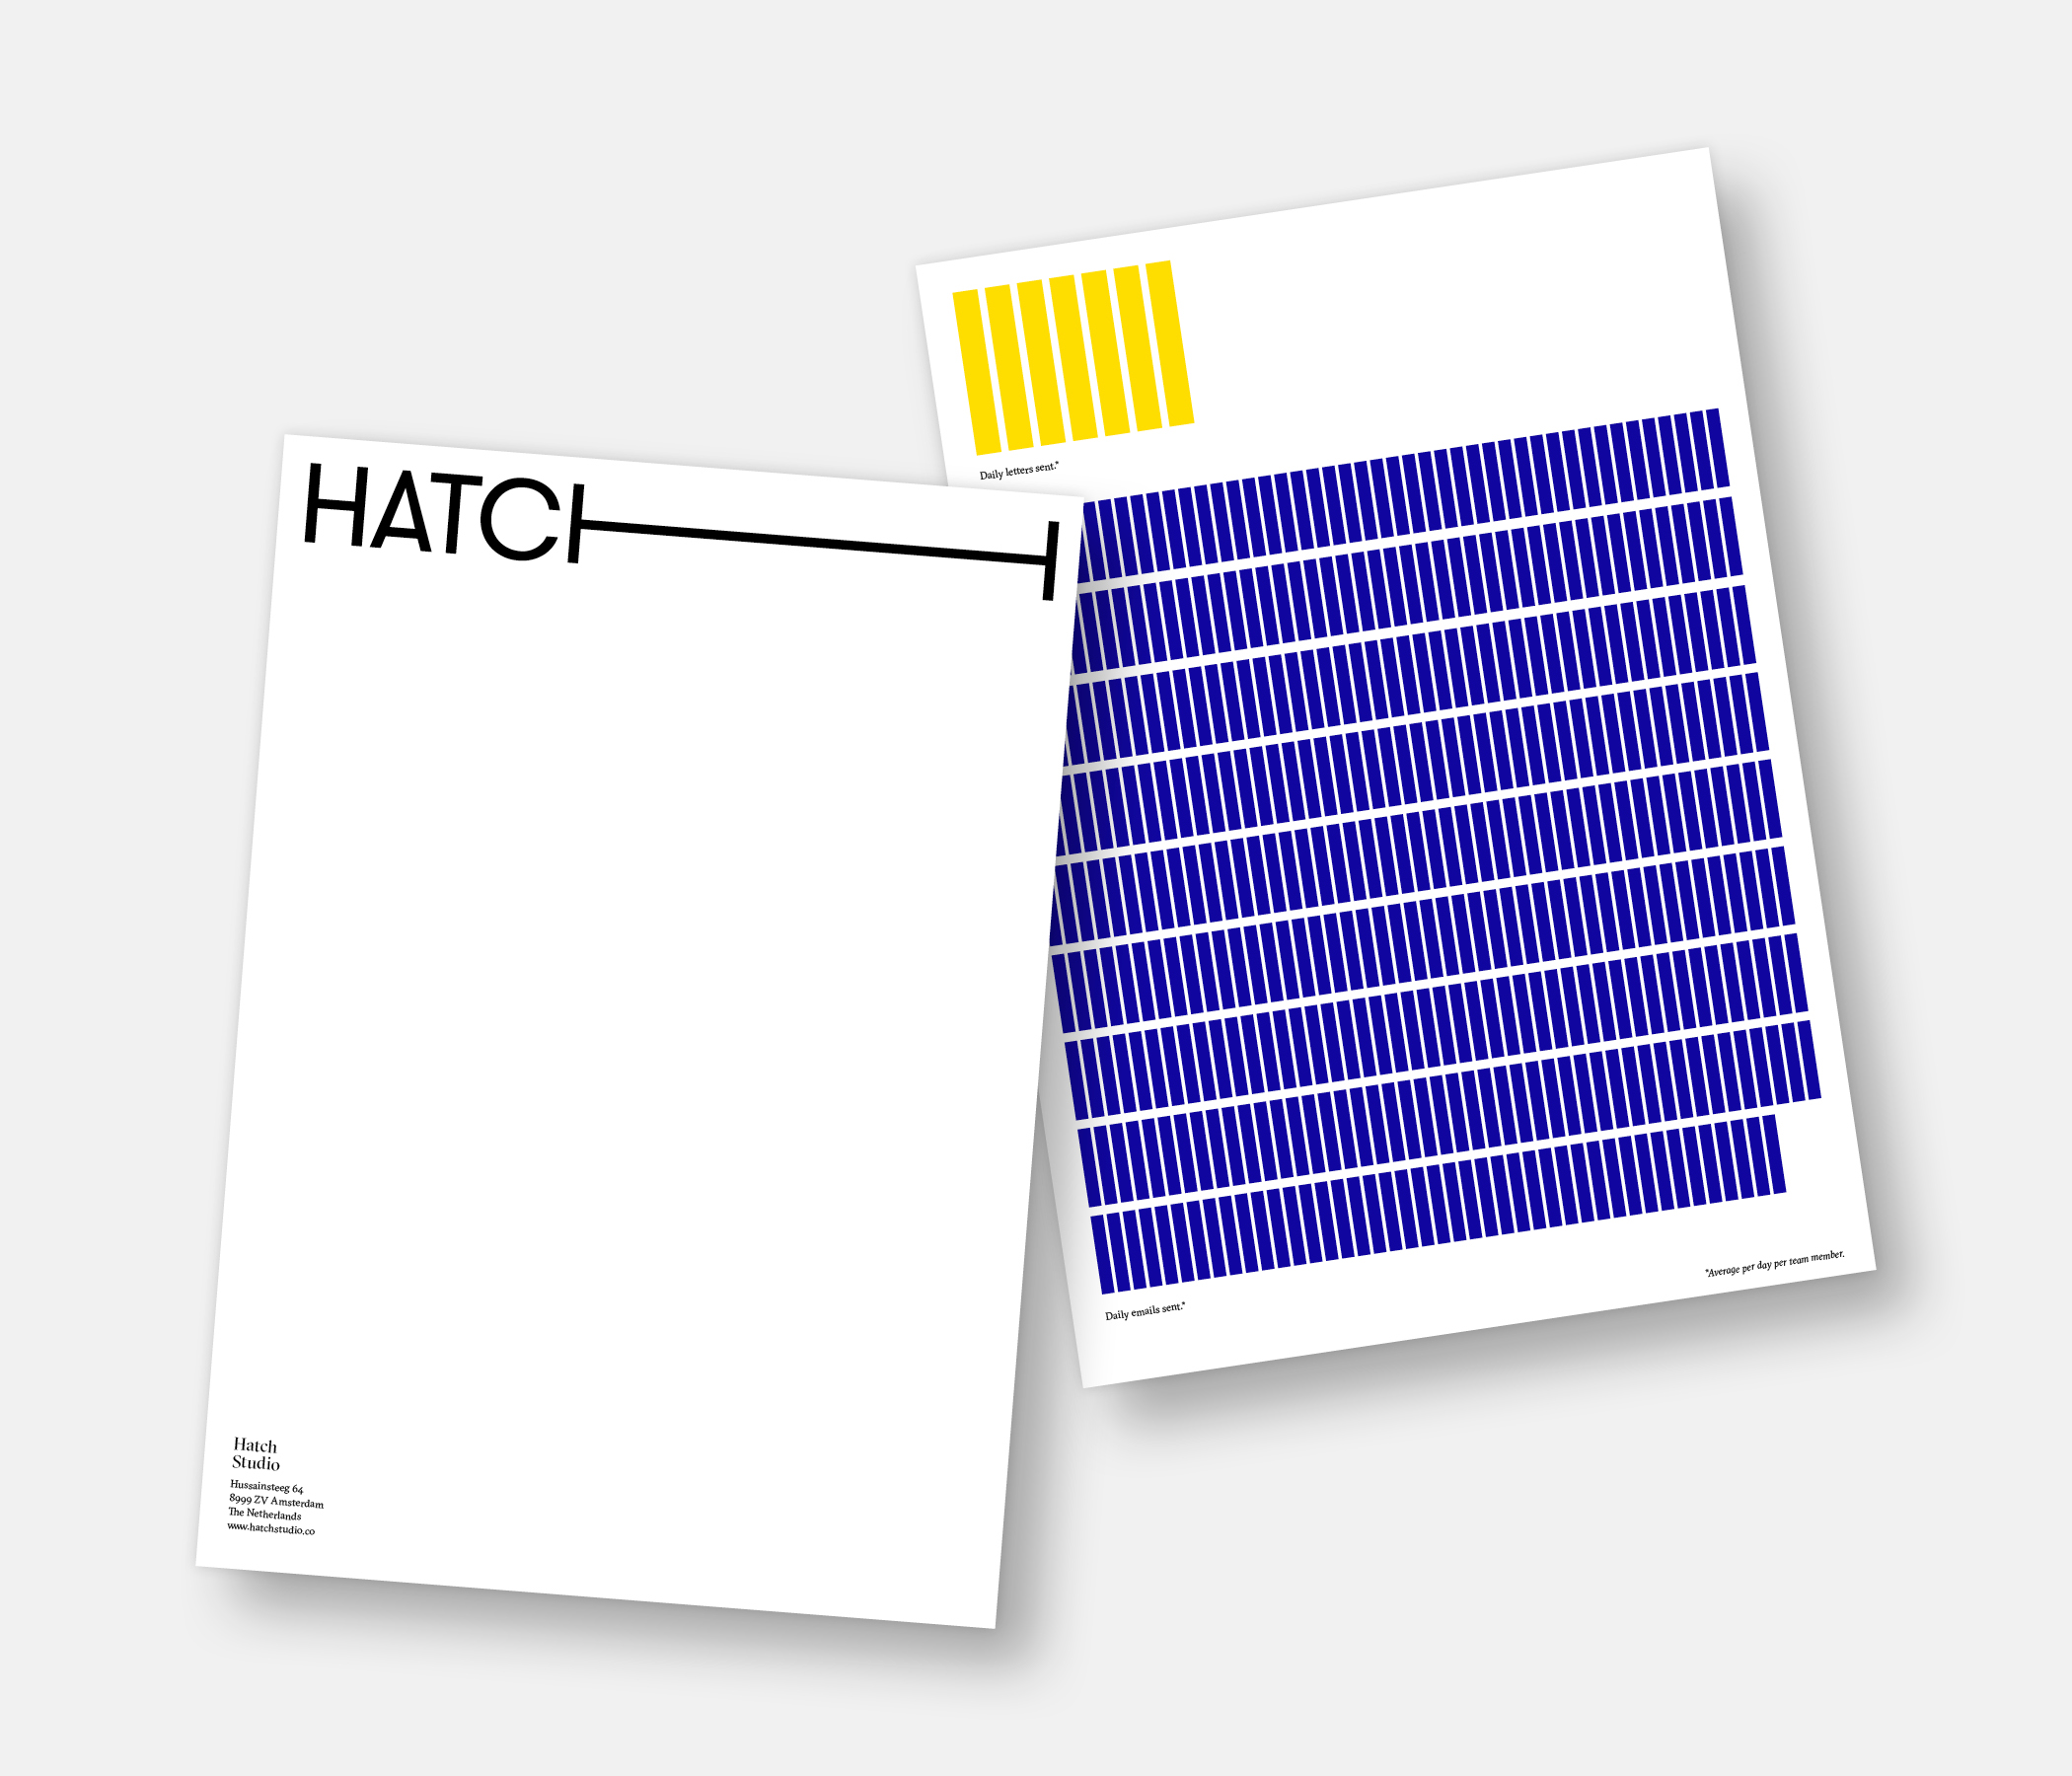 Hatch-website-stills-013.jpg